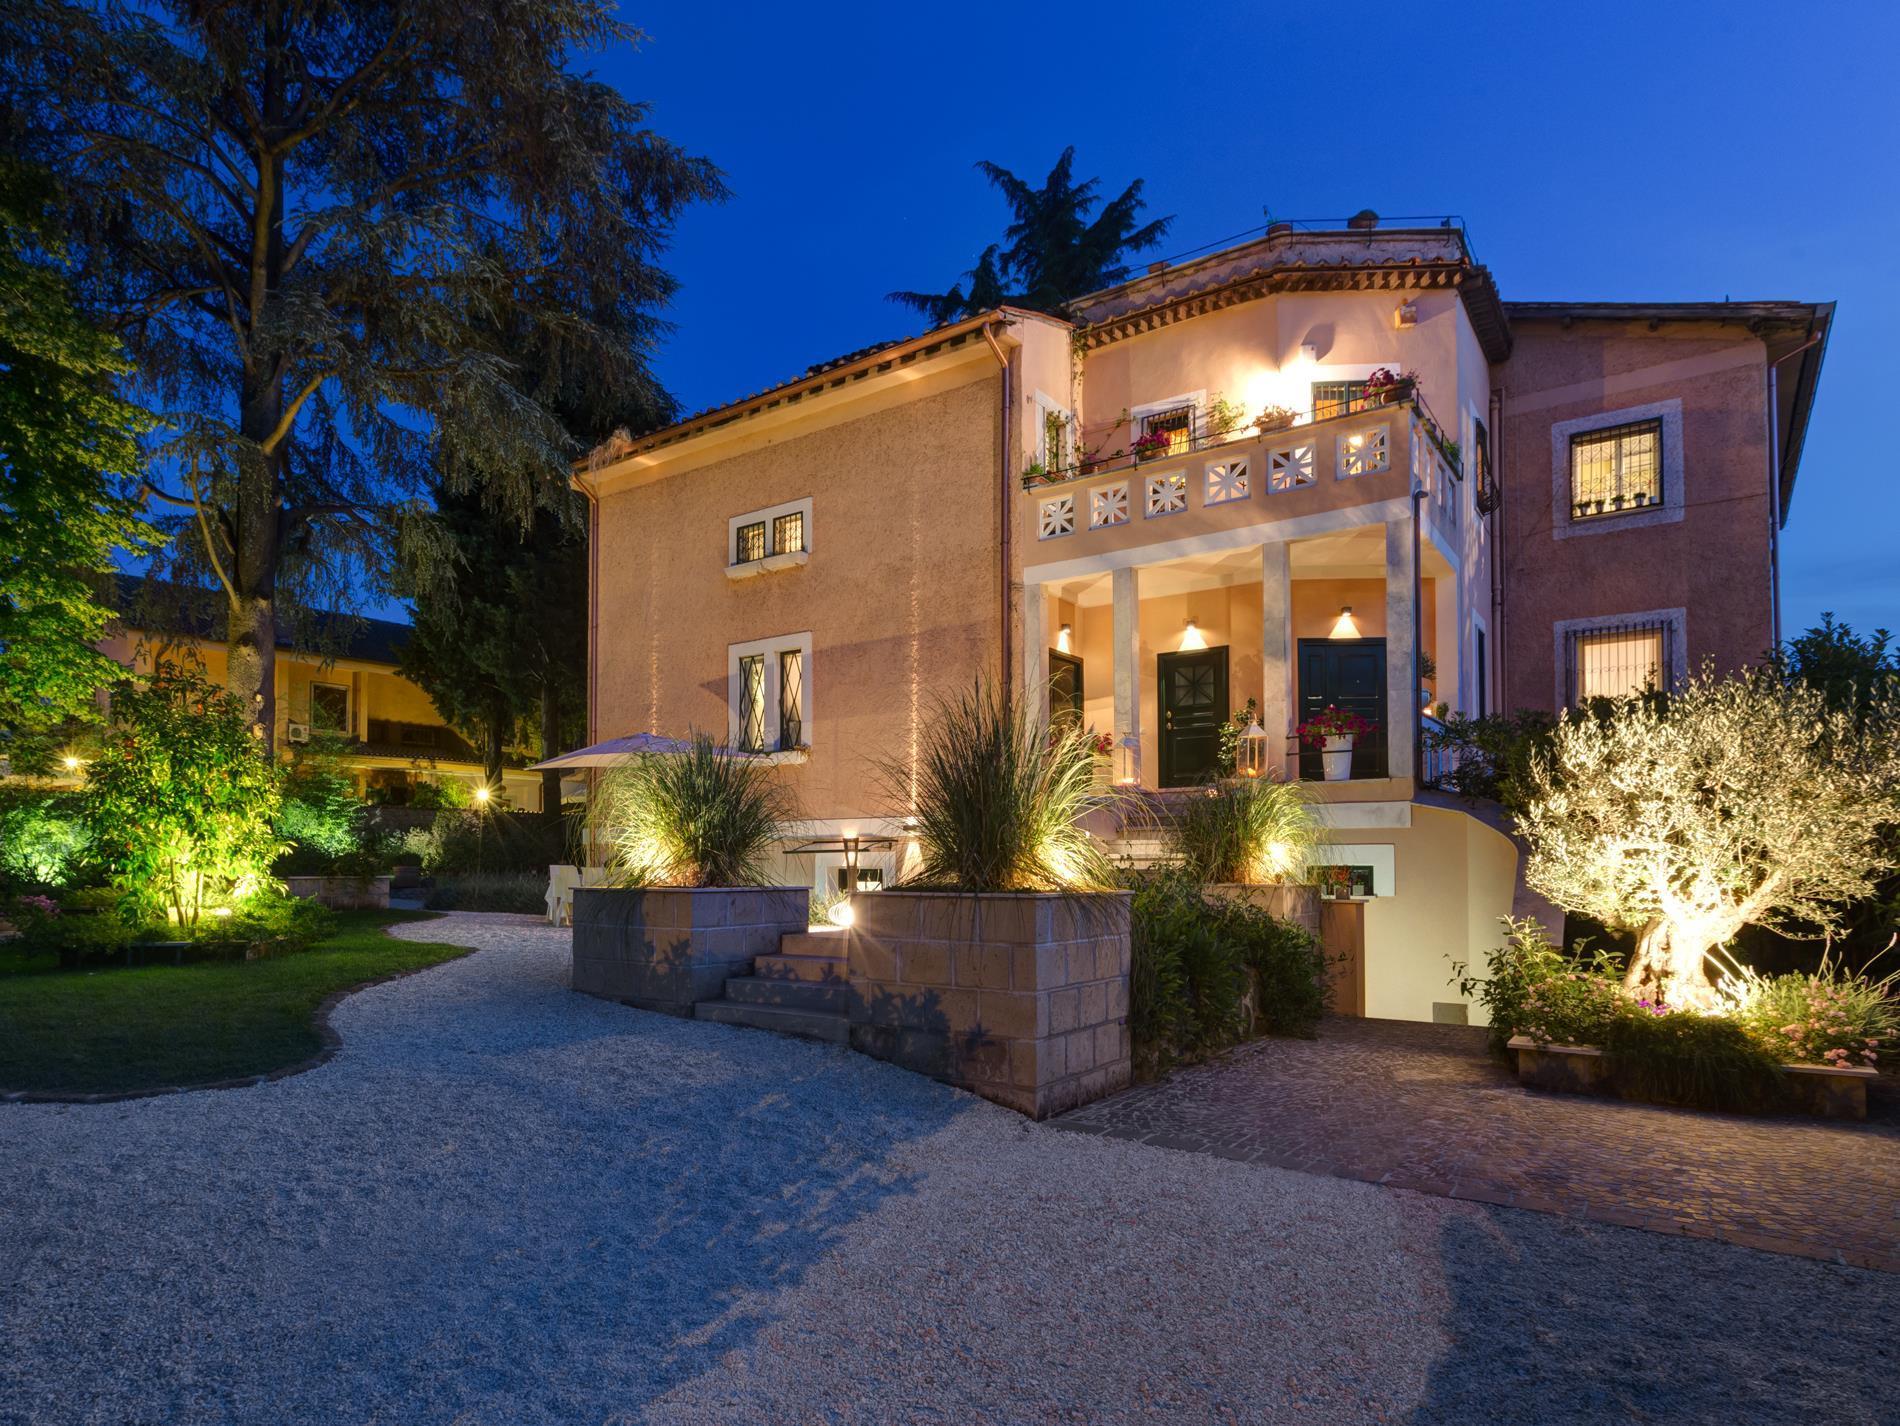 Appia Antica Resort